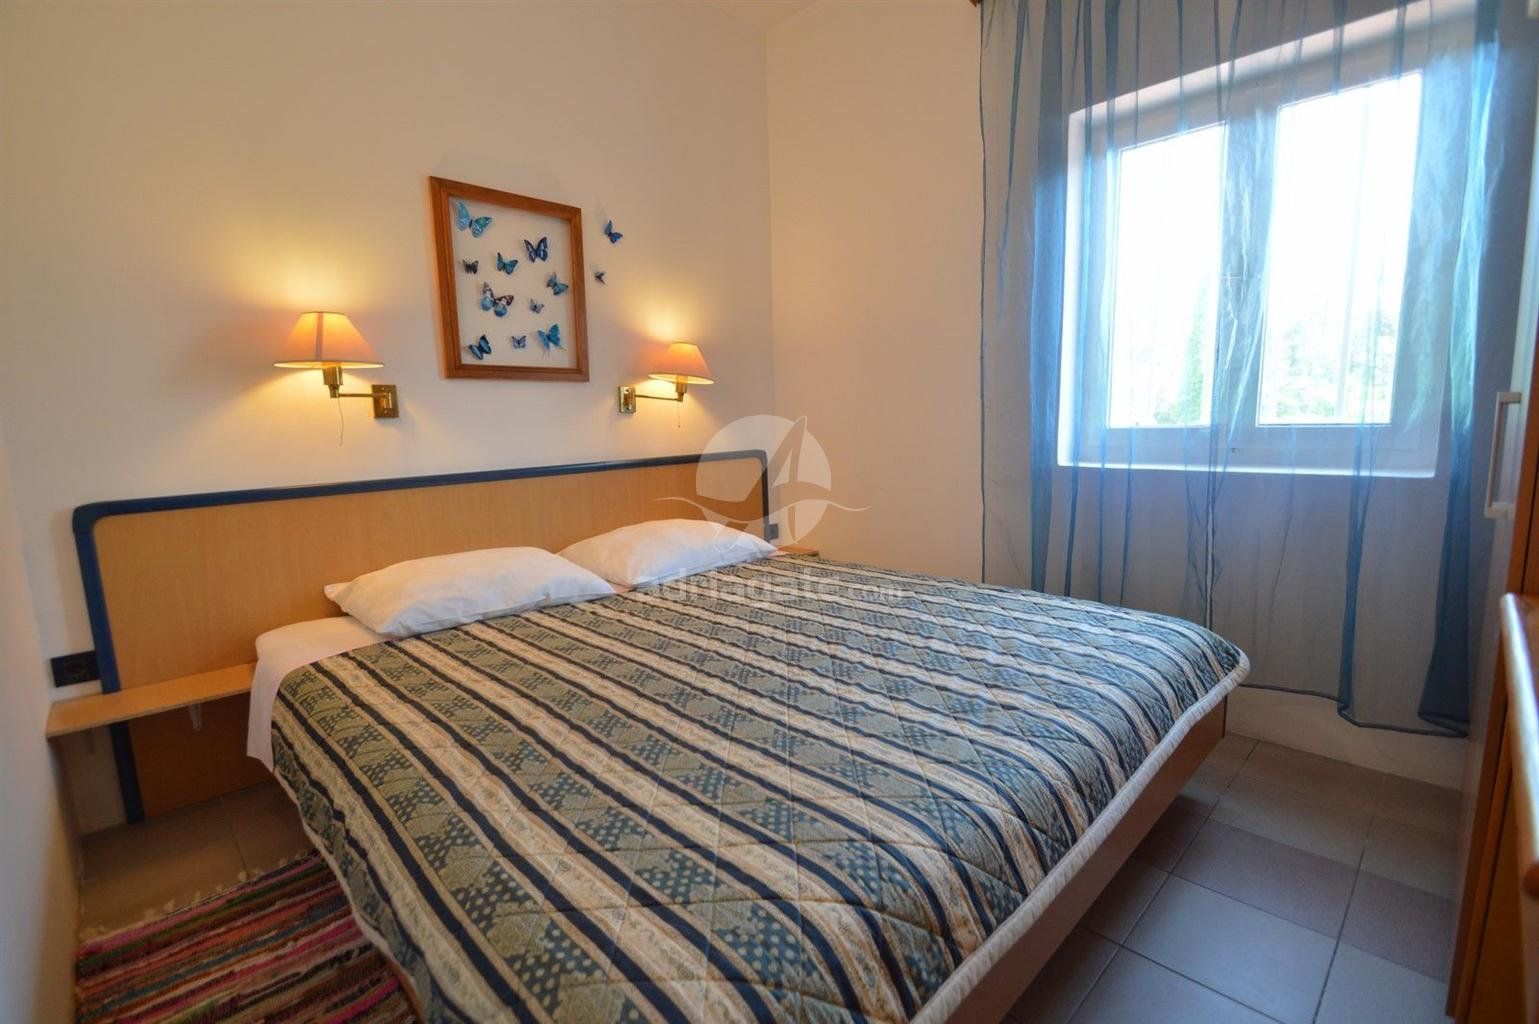 Ferienwohnung Ferienwohnungen GOGA 23531-A3 (2021392), Mali Lošinj, Insel Losinj, Kvarner, Kroatien, Bild 12